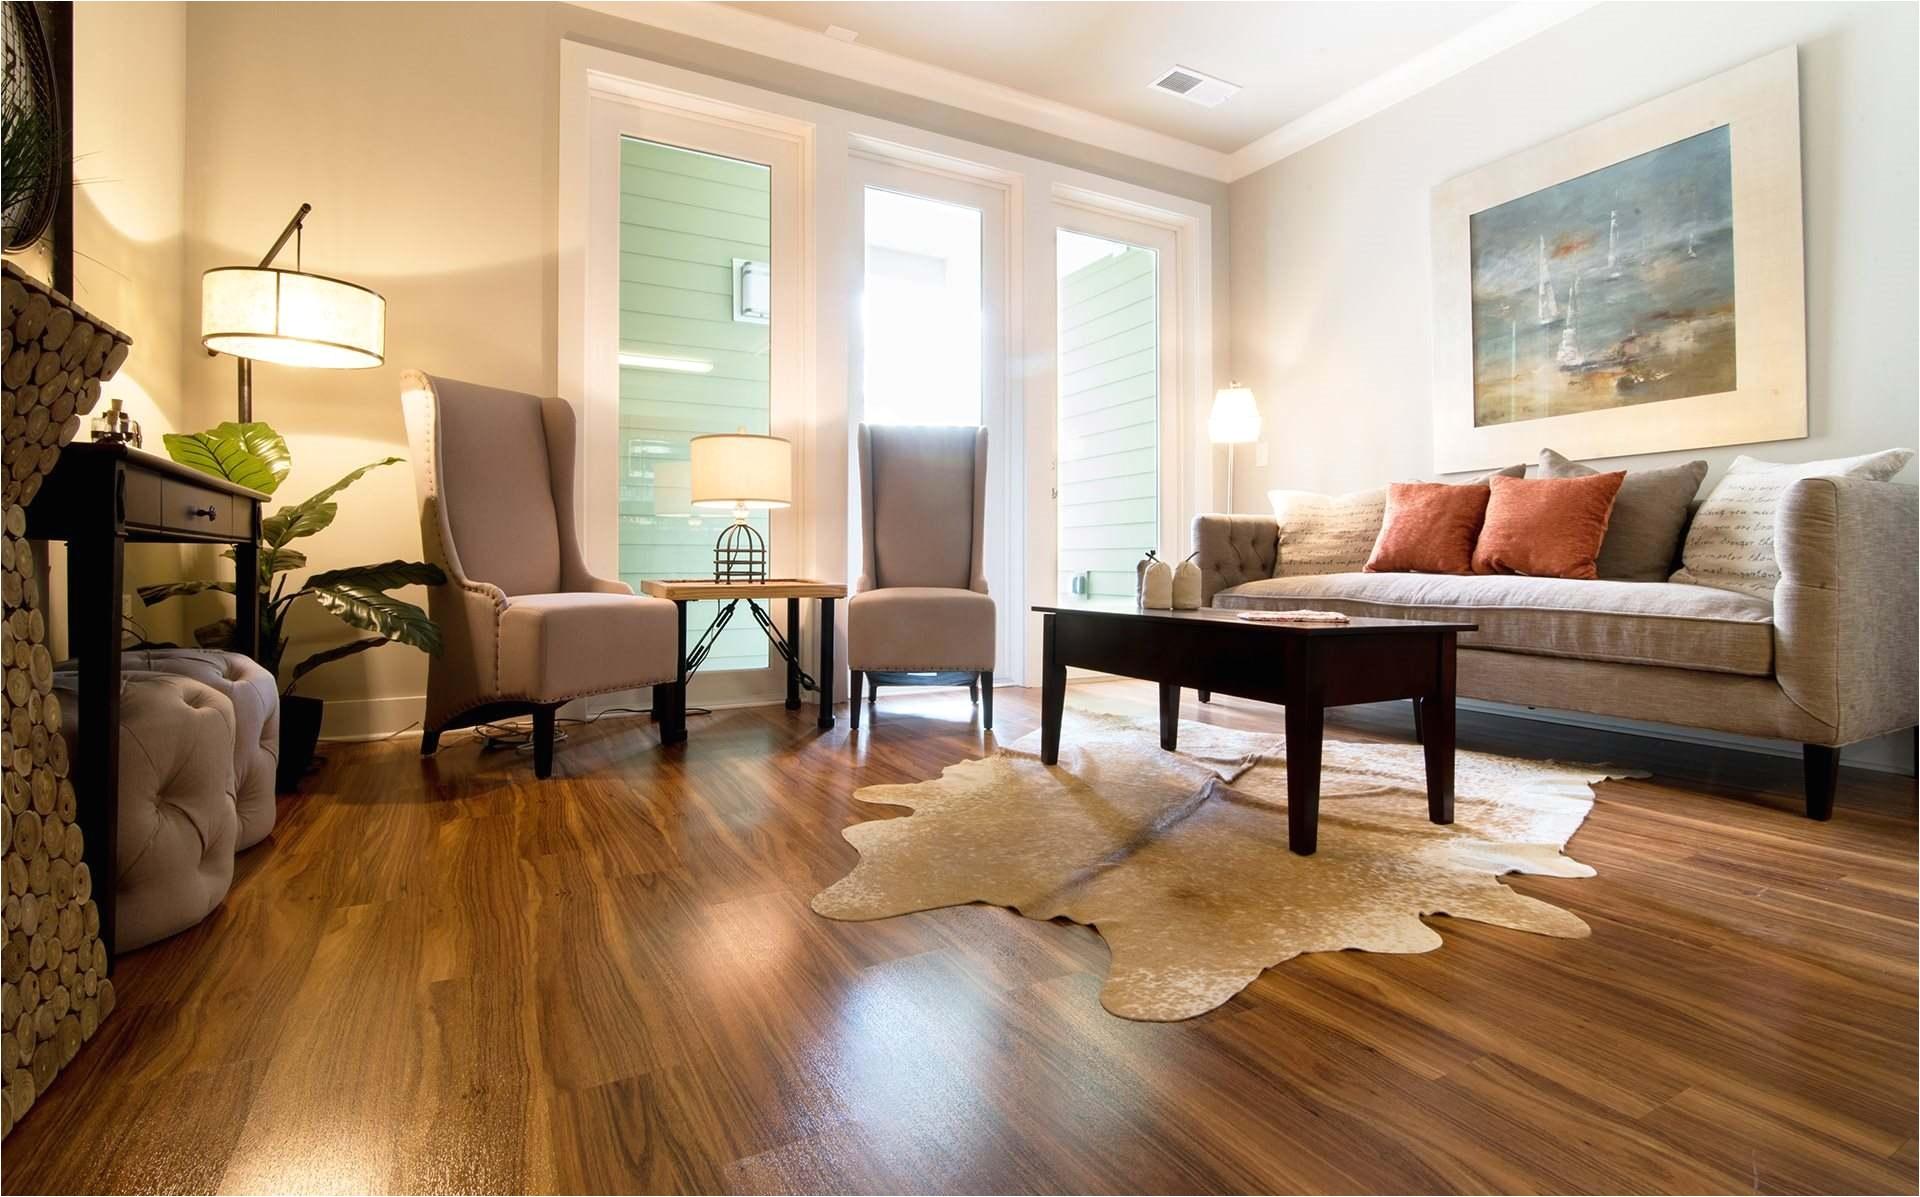 27 1 bedroom apartments jacksonville fl gorgeous city block